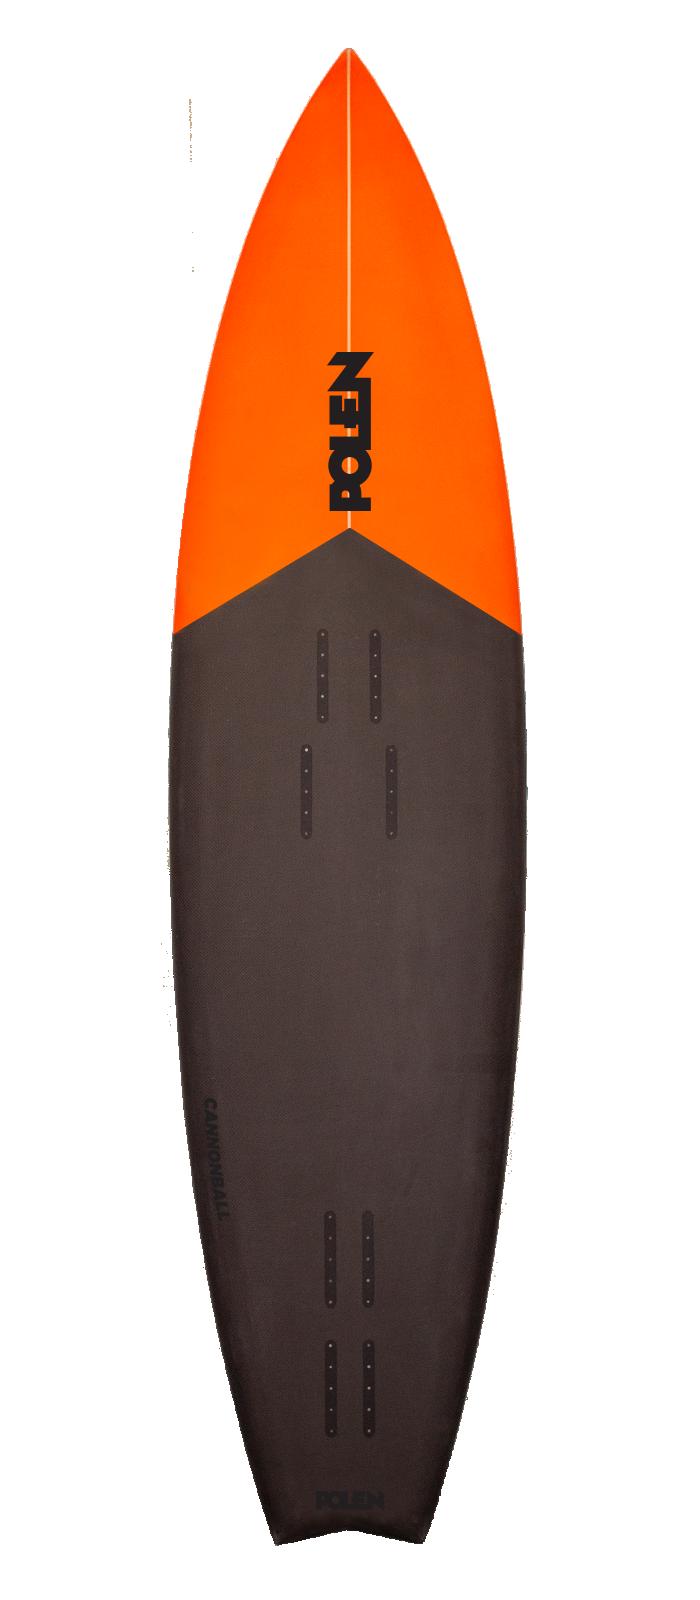 CANNONBALL surfboard model